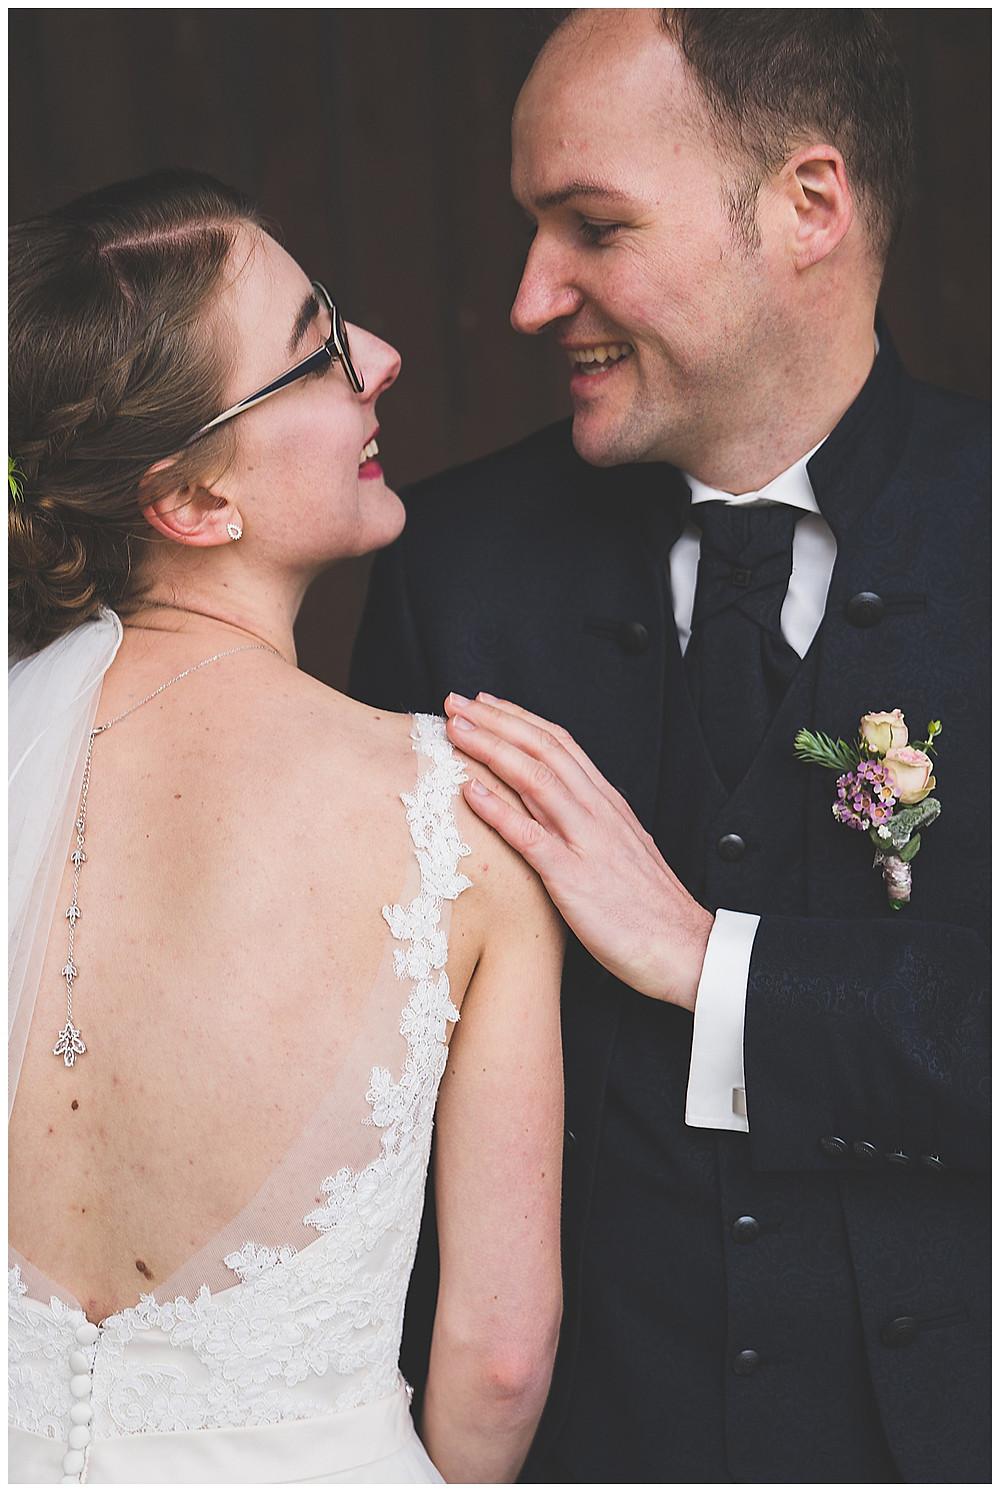 Brautpaarfotos Langenau